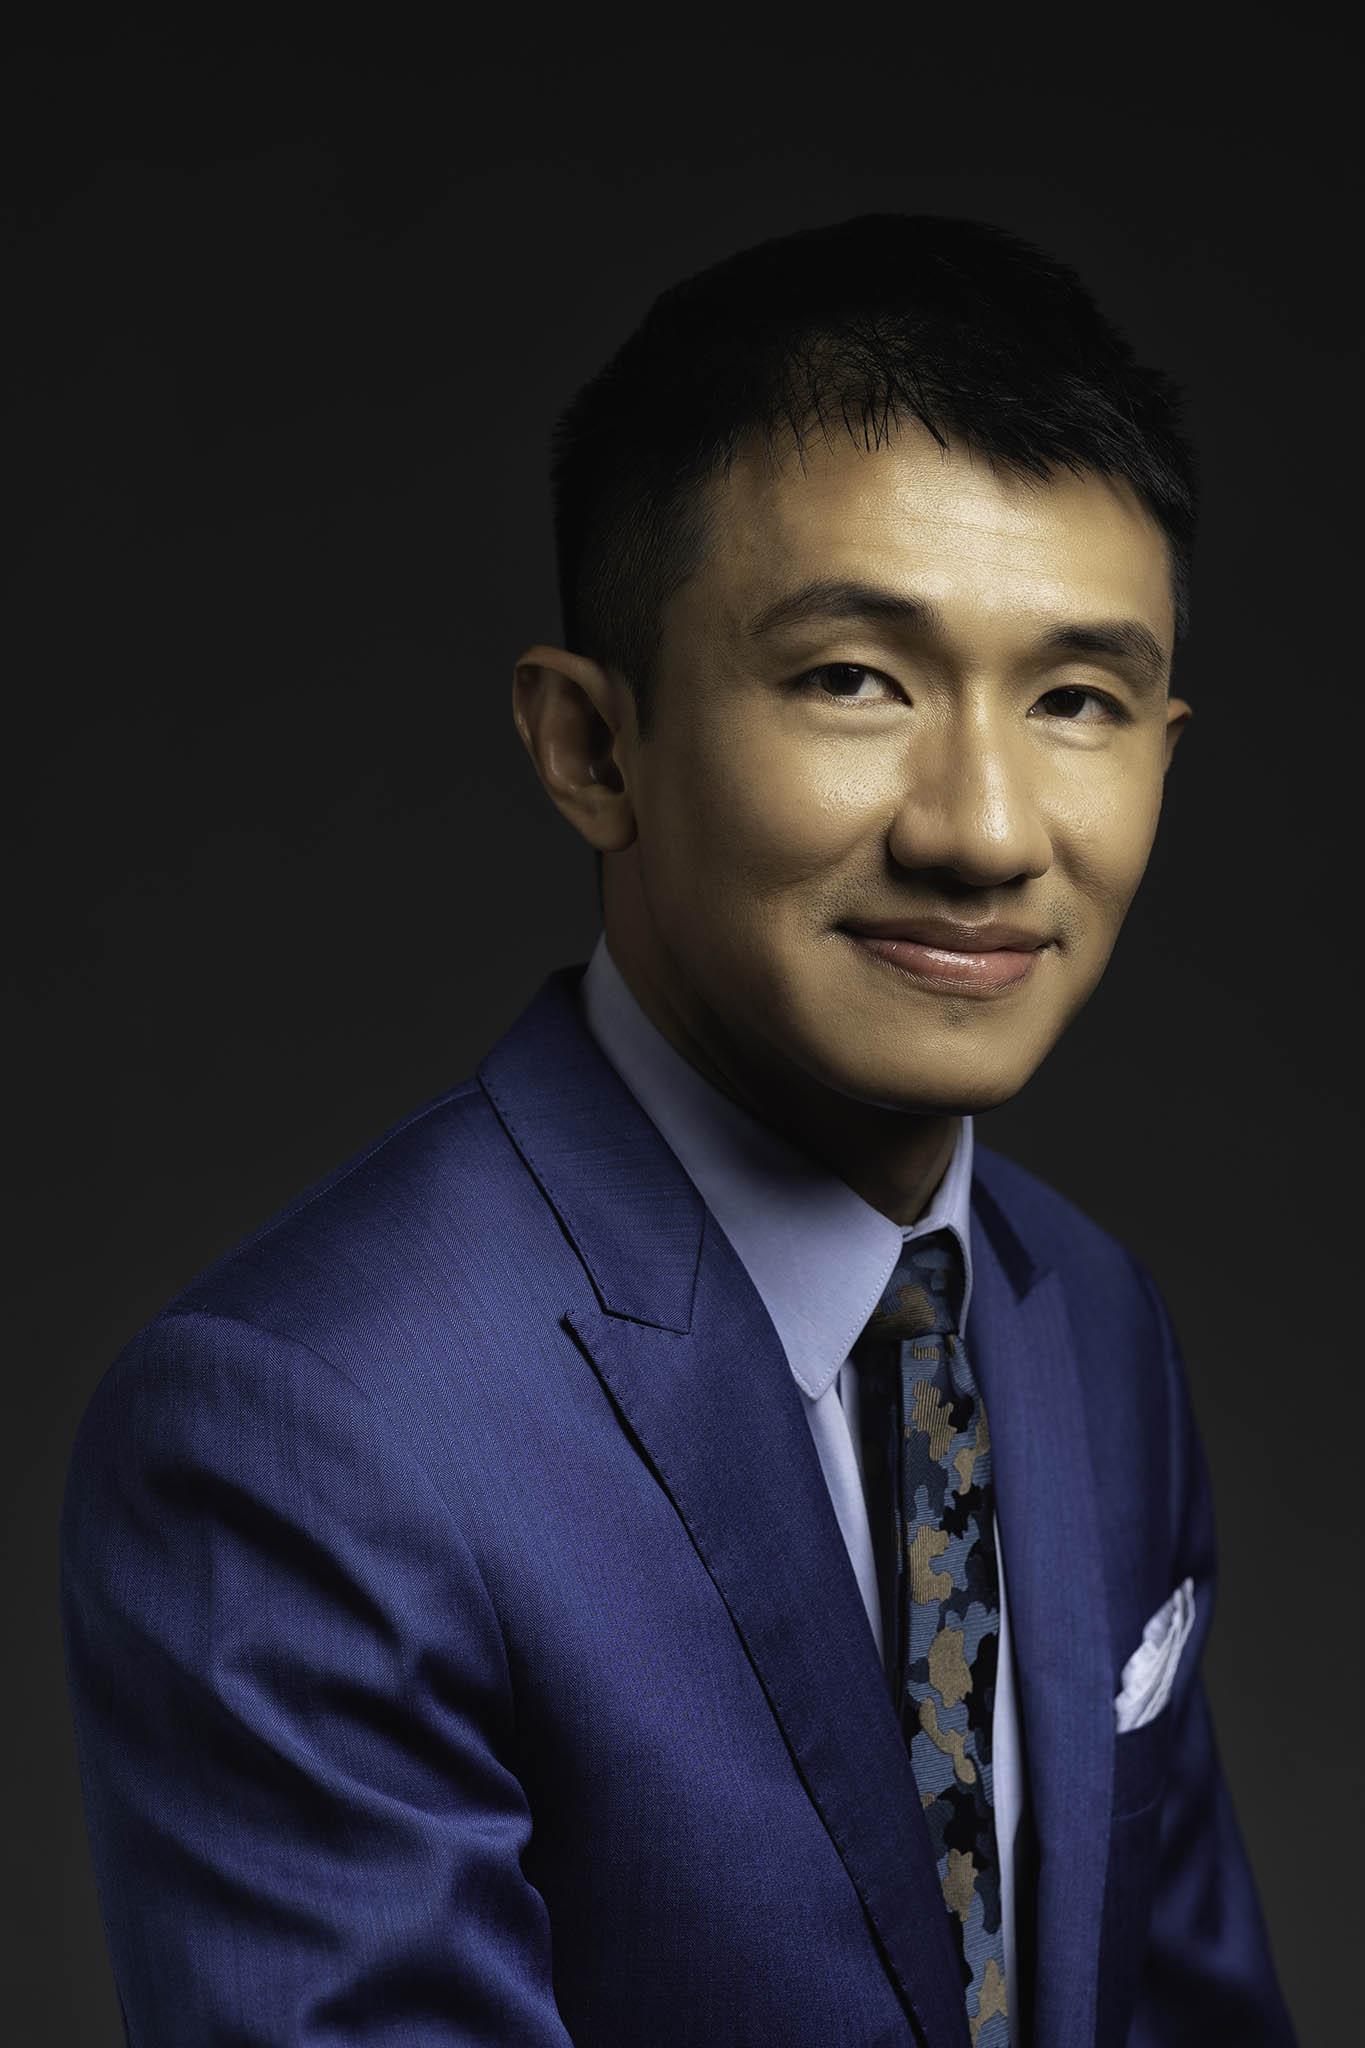 singapore-corporate-portraits-zainalzainal-2.jpg